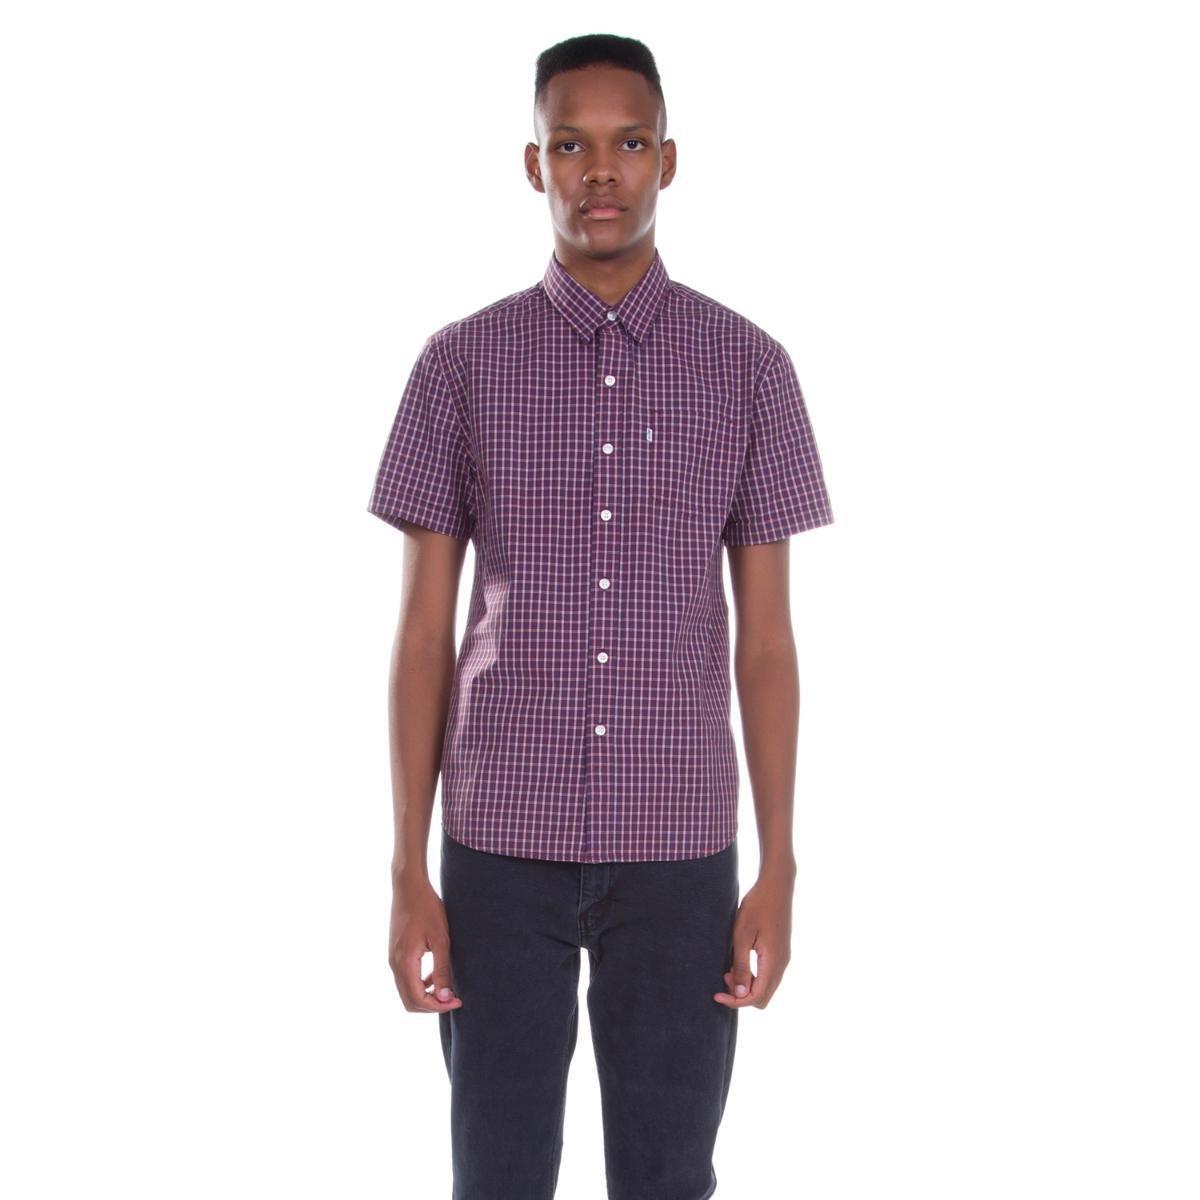 Camisa Levis Short Sleeve Classic One Pocket Xadrez - Compre Agora ... fae4f9c02d2